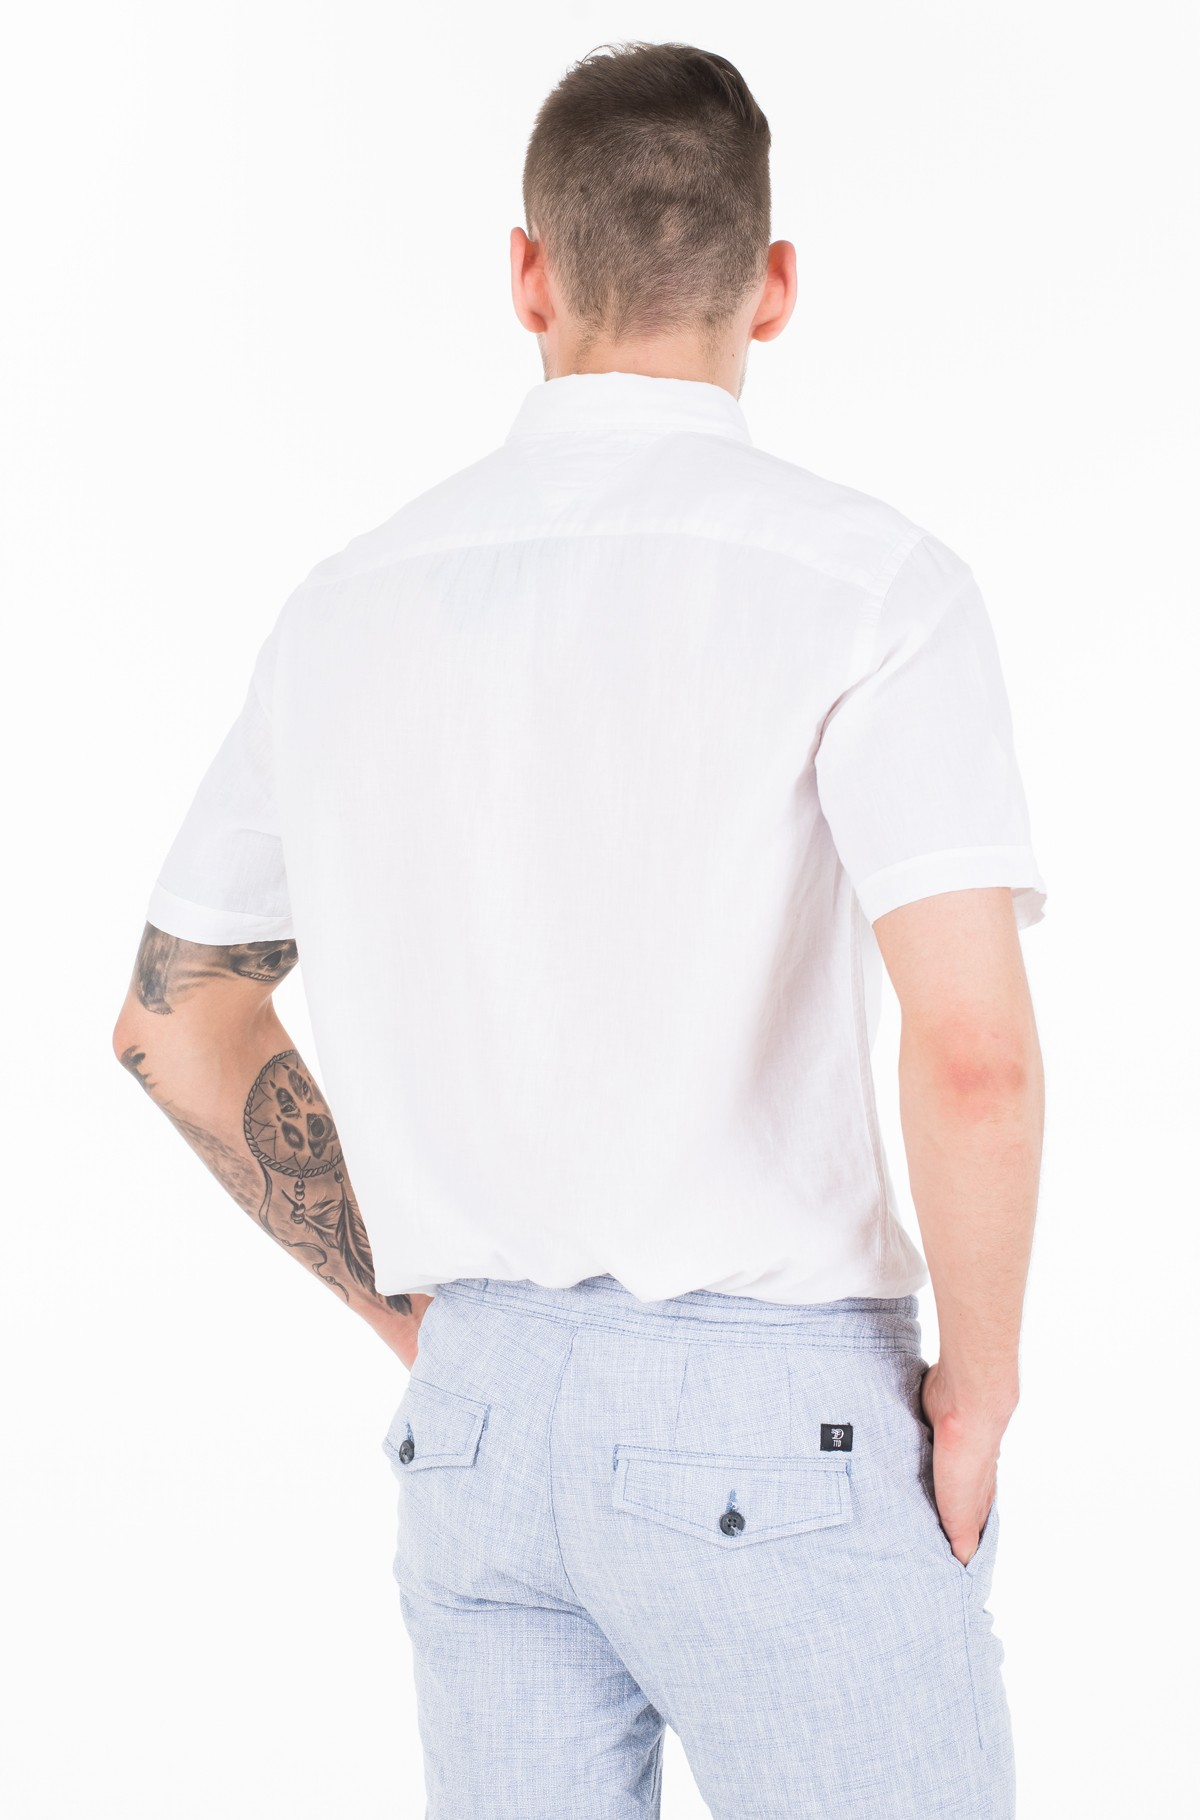 Marškiniai su trumpomis rankovėmis COTTON LINEN SHIRT S/S-full-2